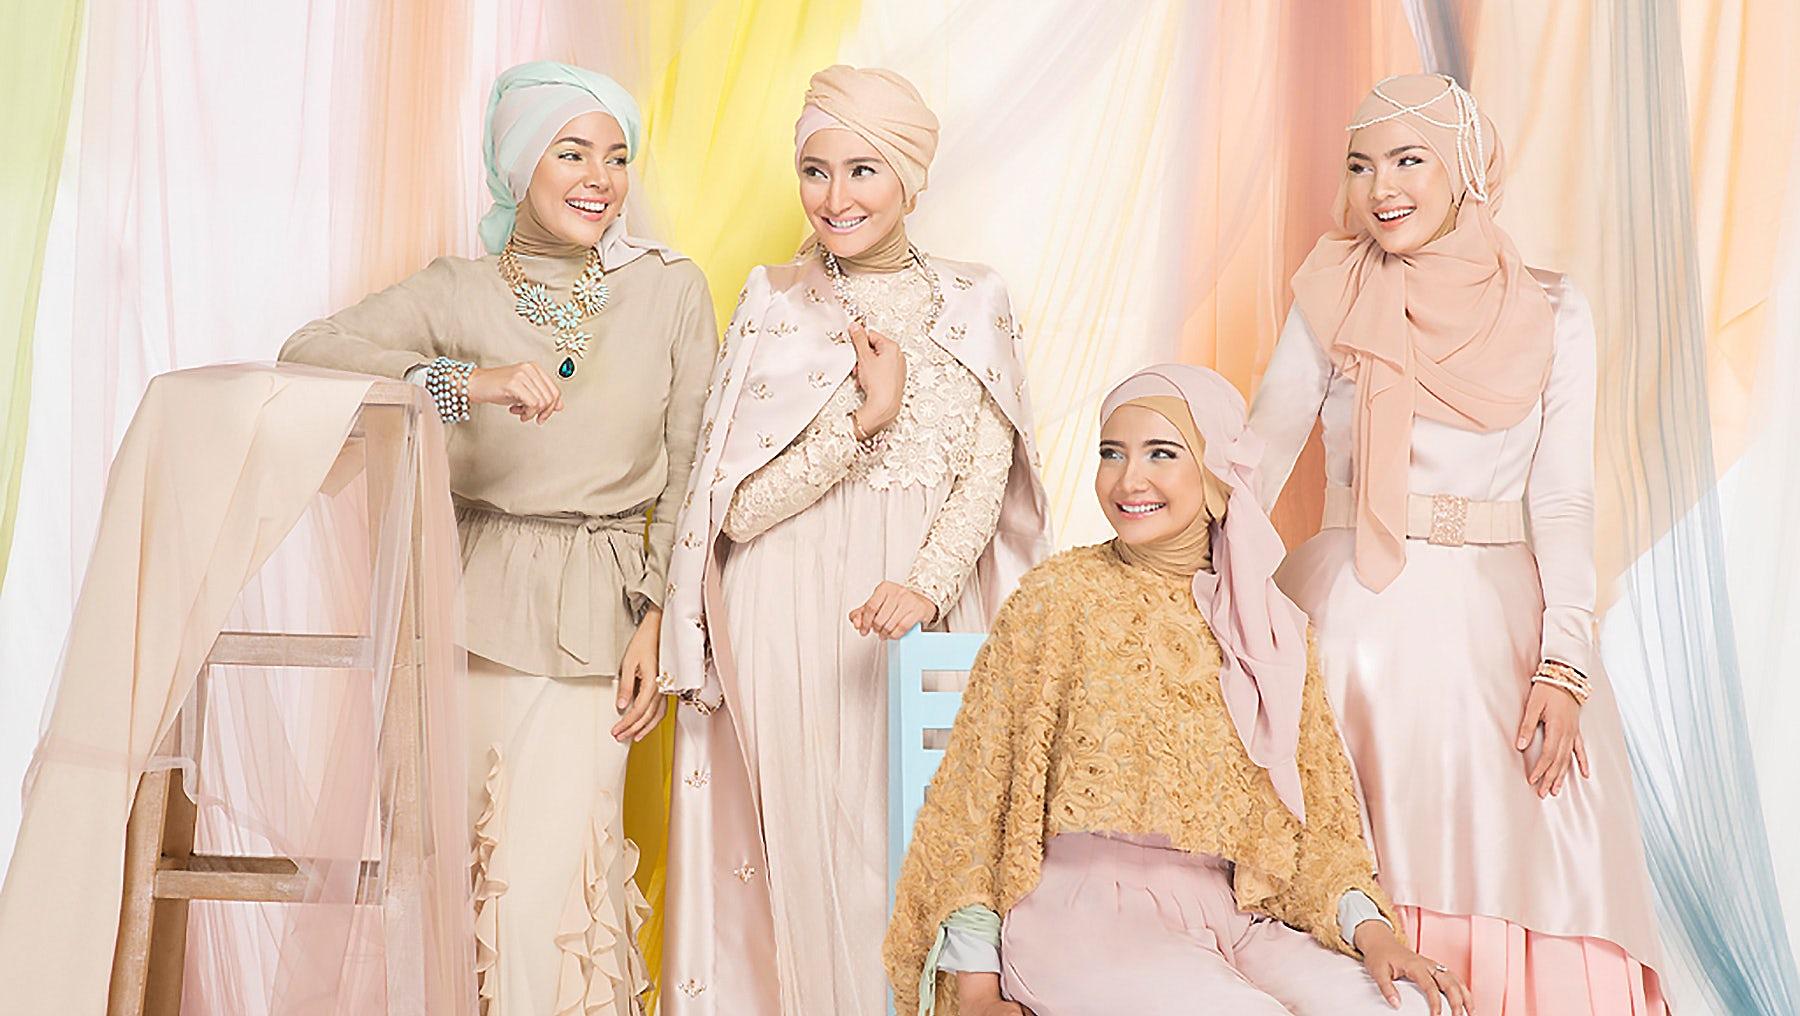 Wardah cosmetics | Source: Wardah